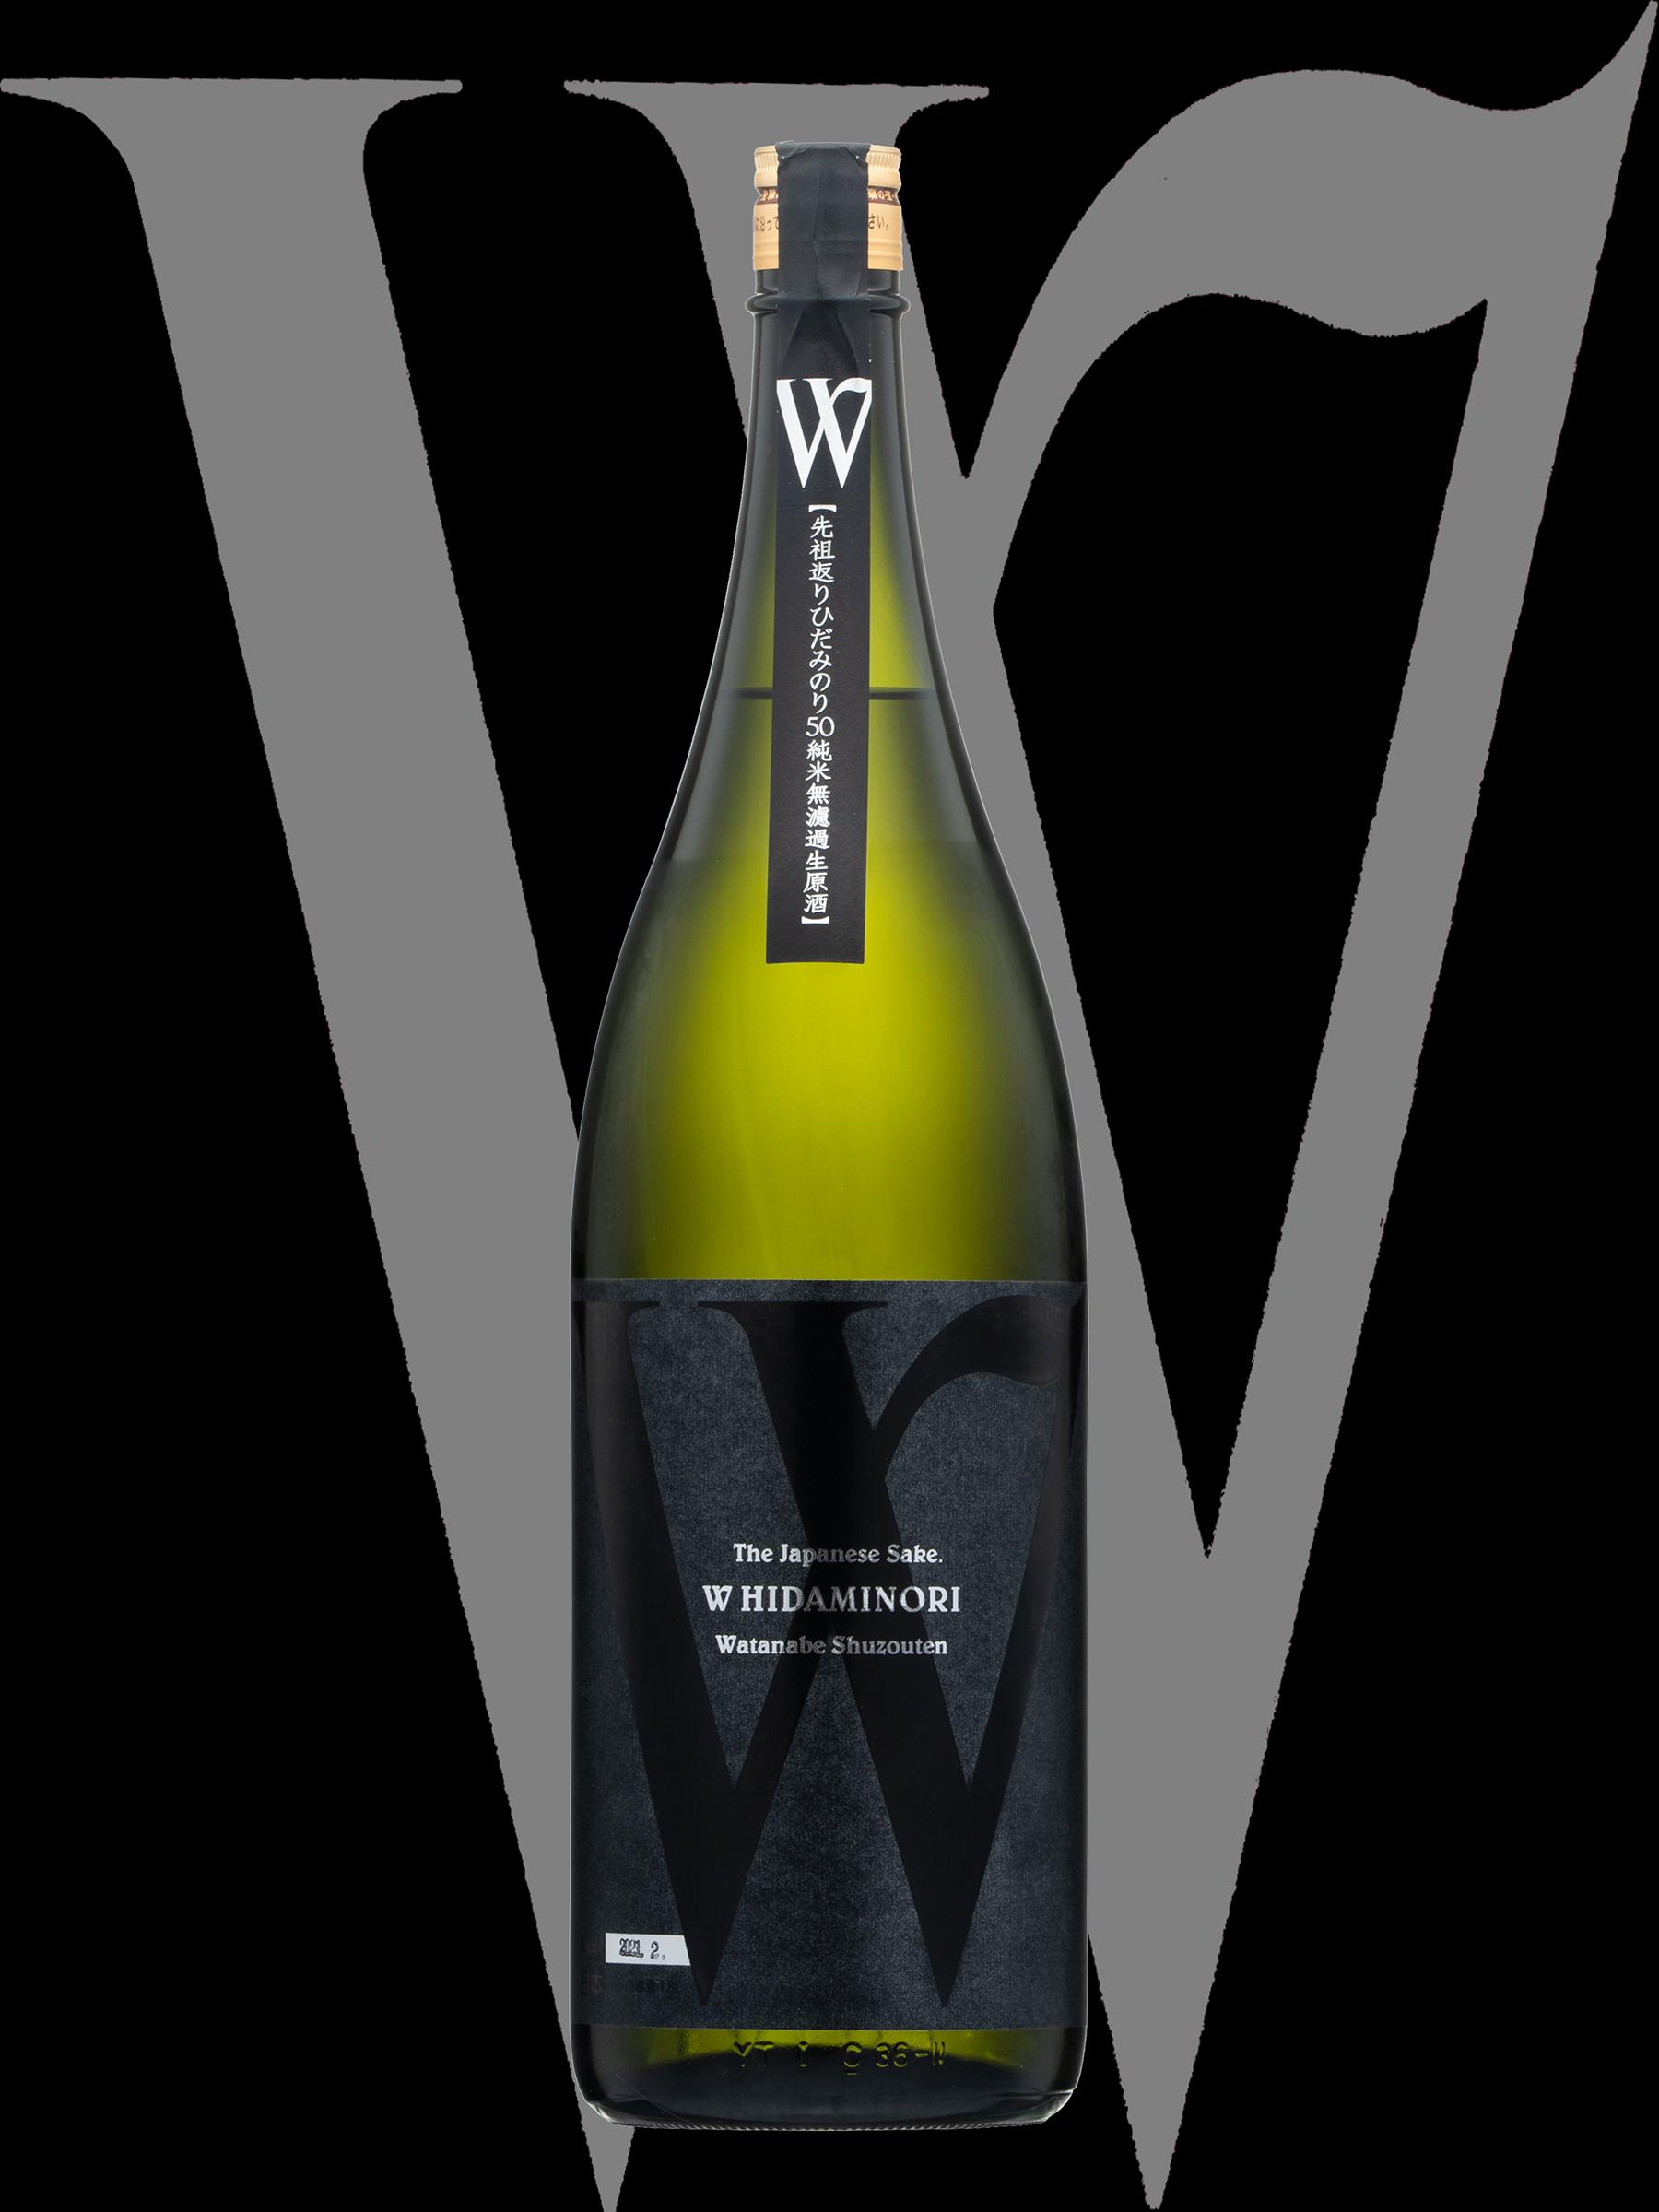 W(ダブリュー)「純米大吟醸」先祖返りひだみのり50無濾過生原酒